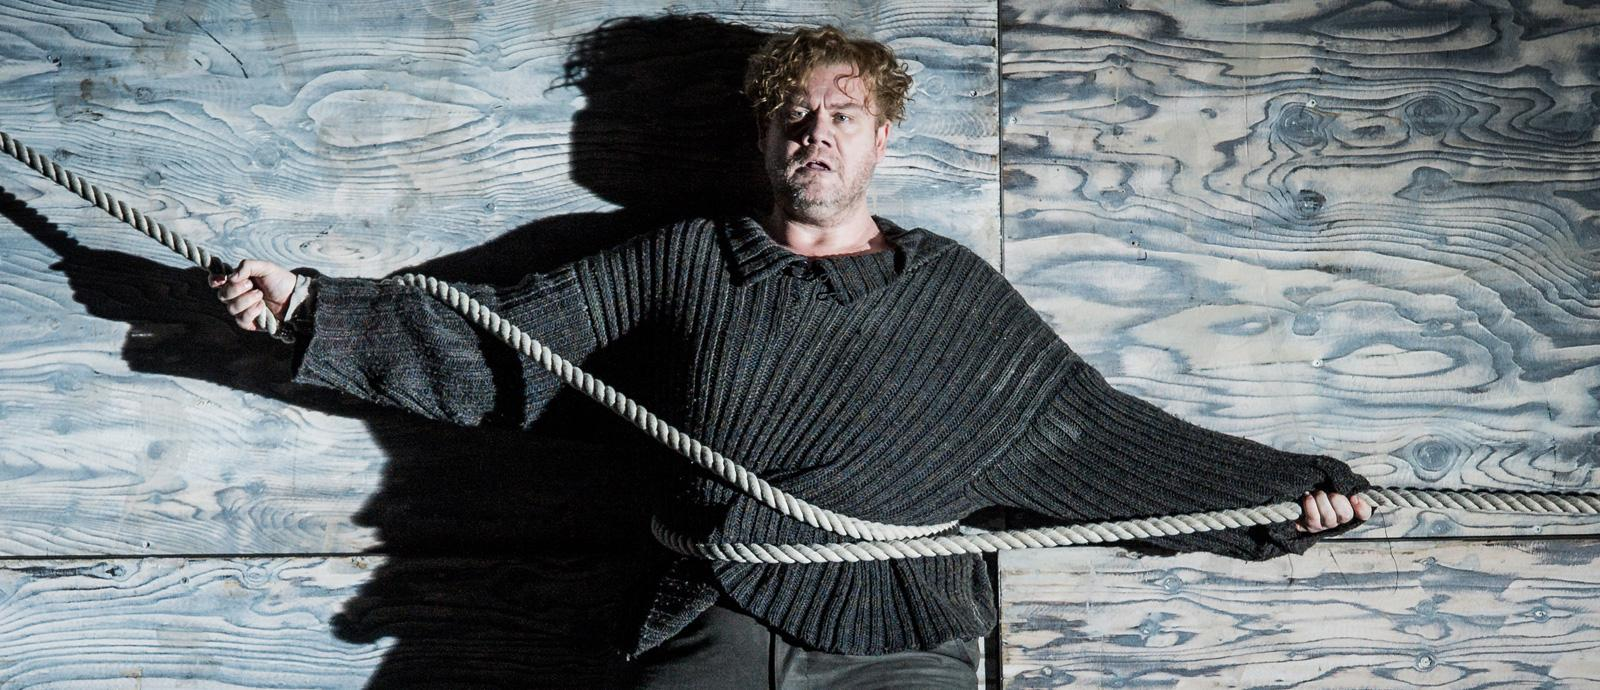 ENO Peter Grimes: Stuart Skelton as Peter Grimes (c) Robert Workman